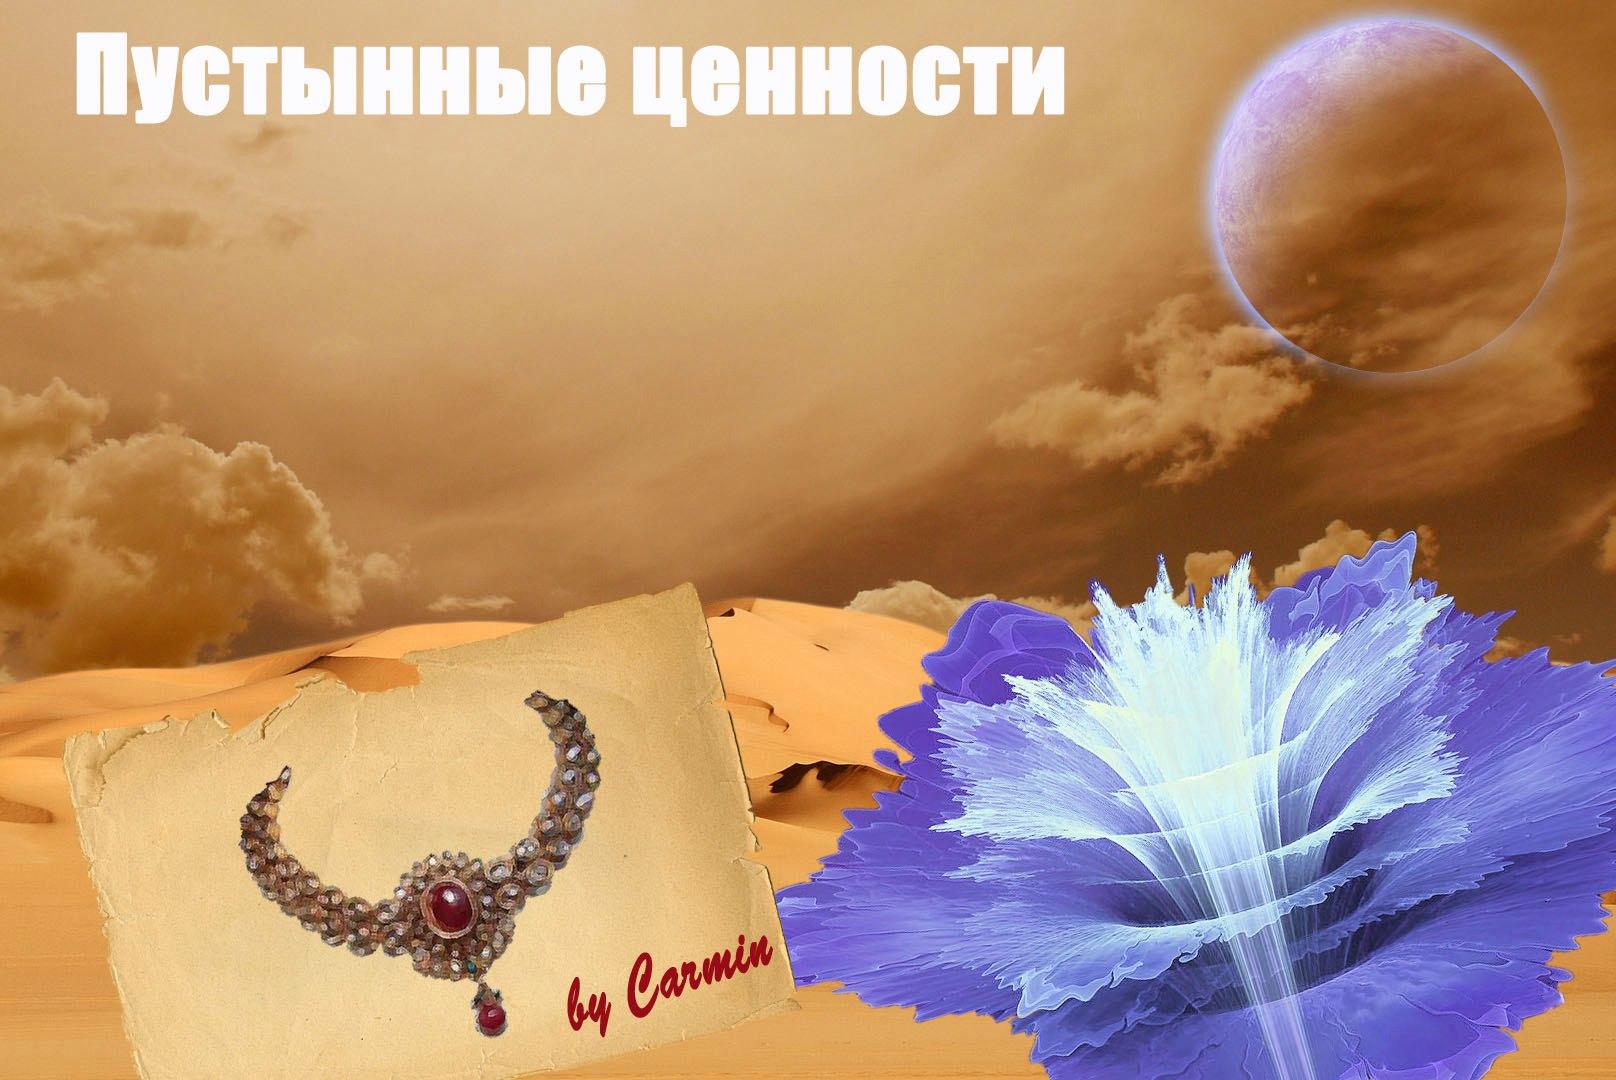 https://pp.userapi.com/c841136/v841136705/150d5/99RggERMdbg.jpg